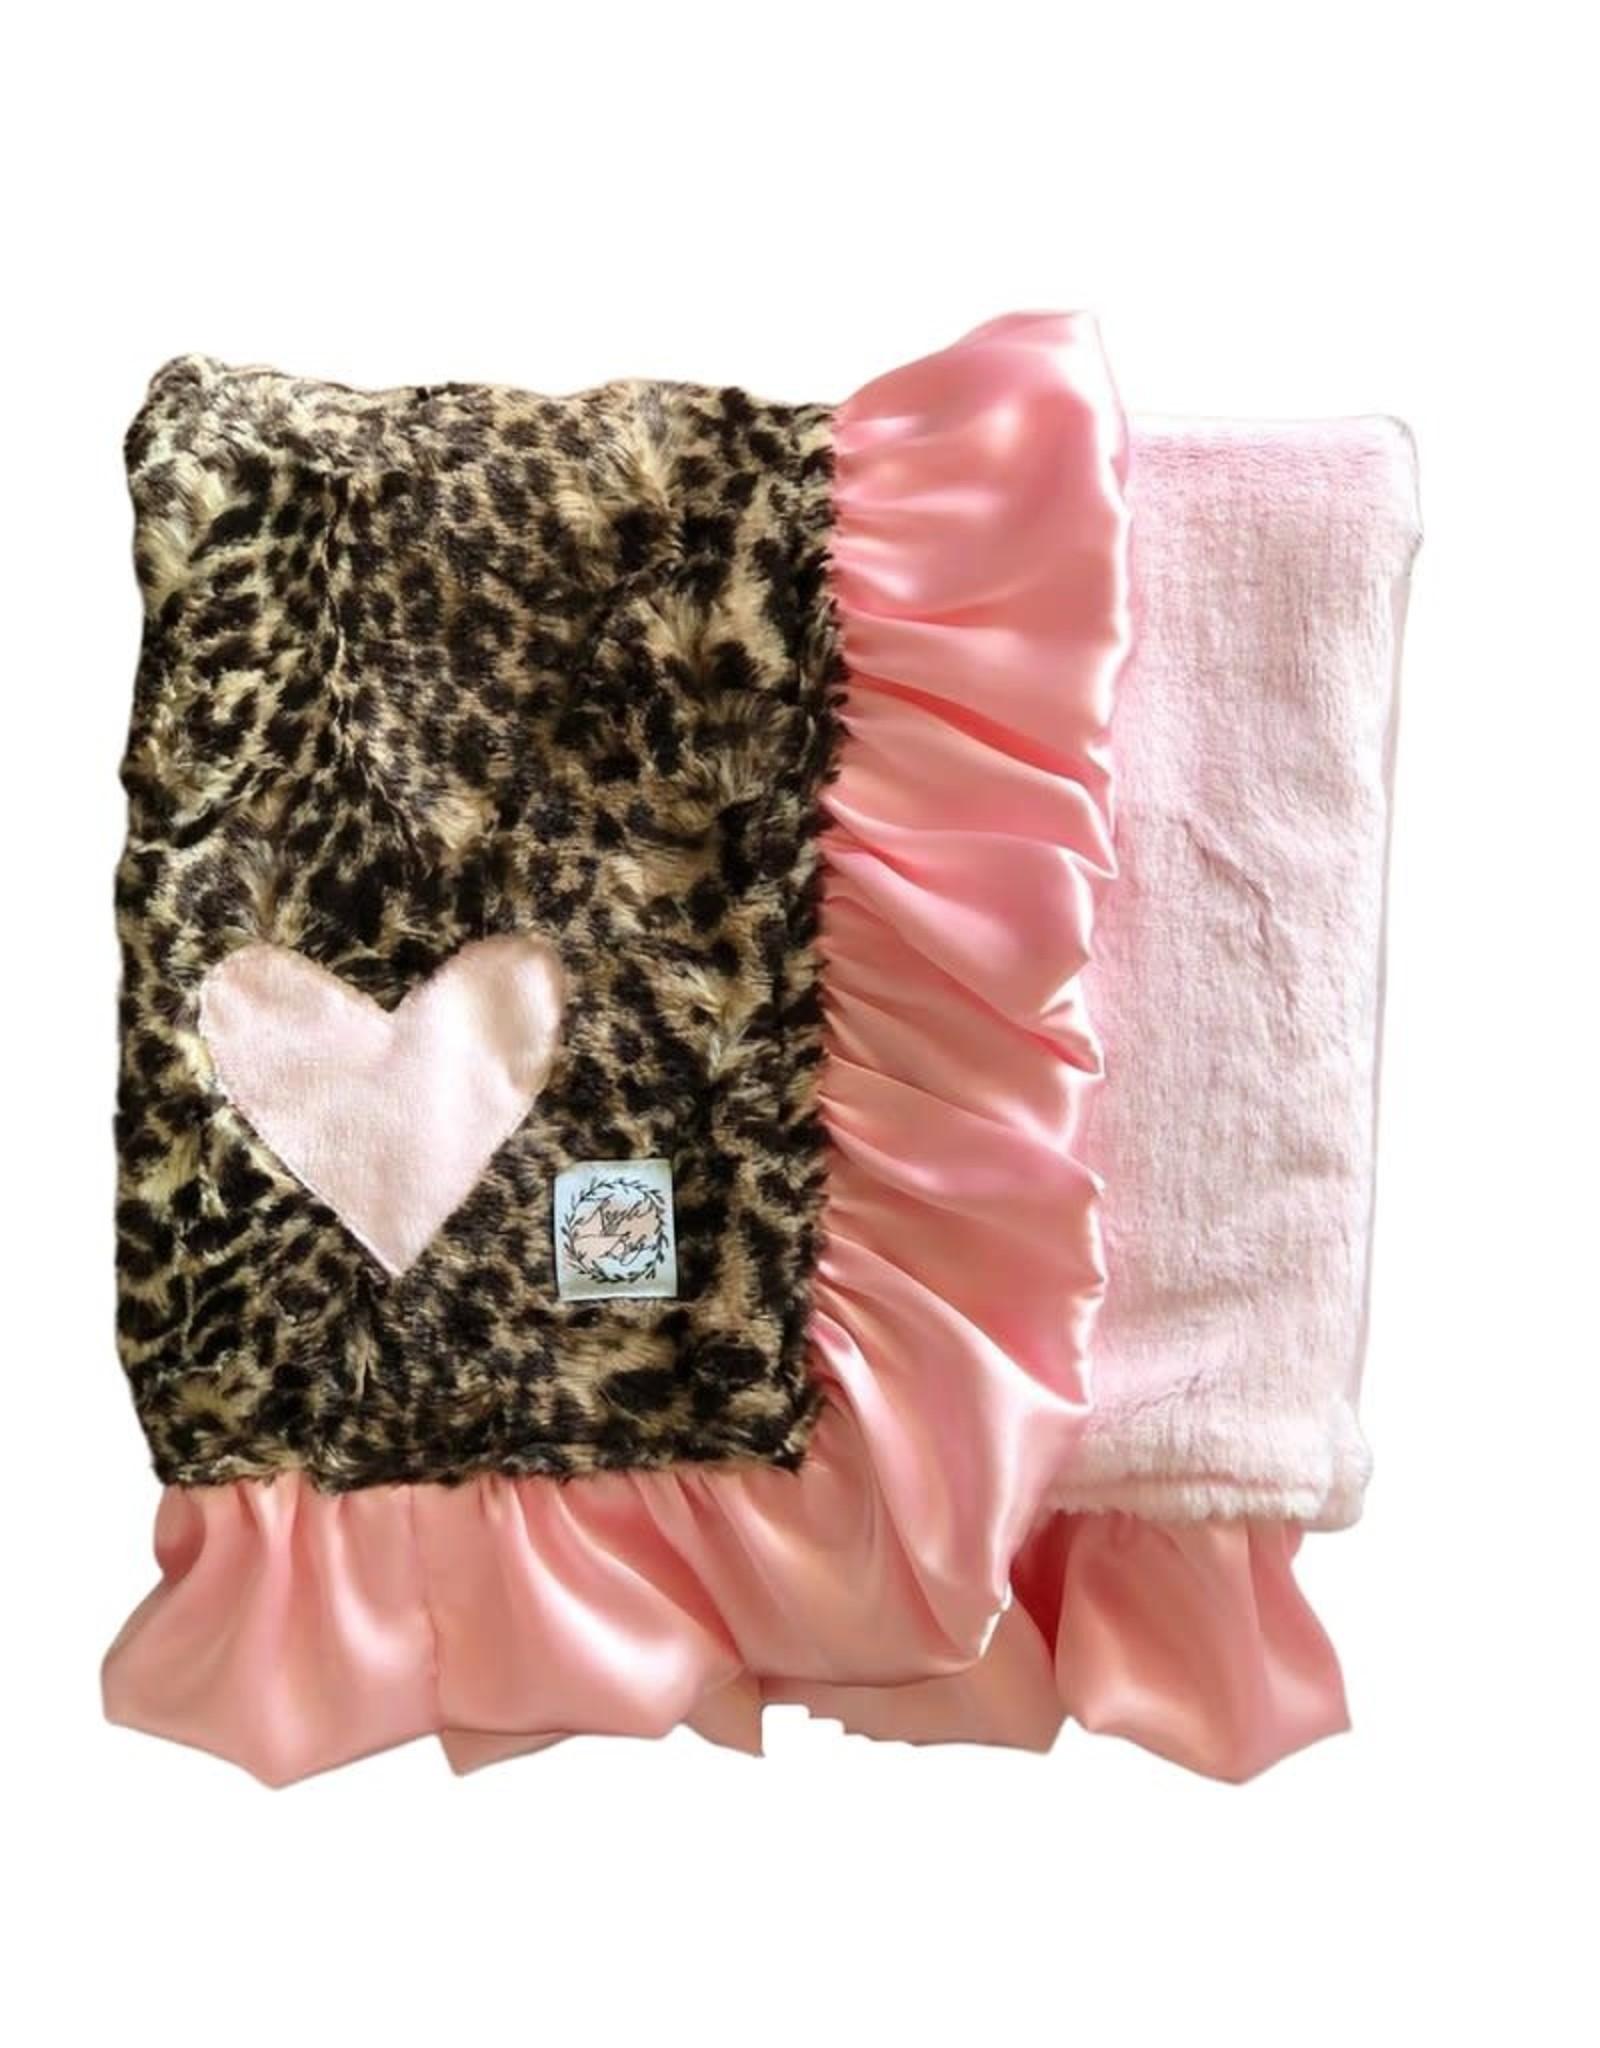 Razzle Baby Razzle Baby- Double Plush Double Ruffle Leopard w/Pink Heart Blanket